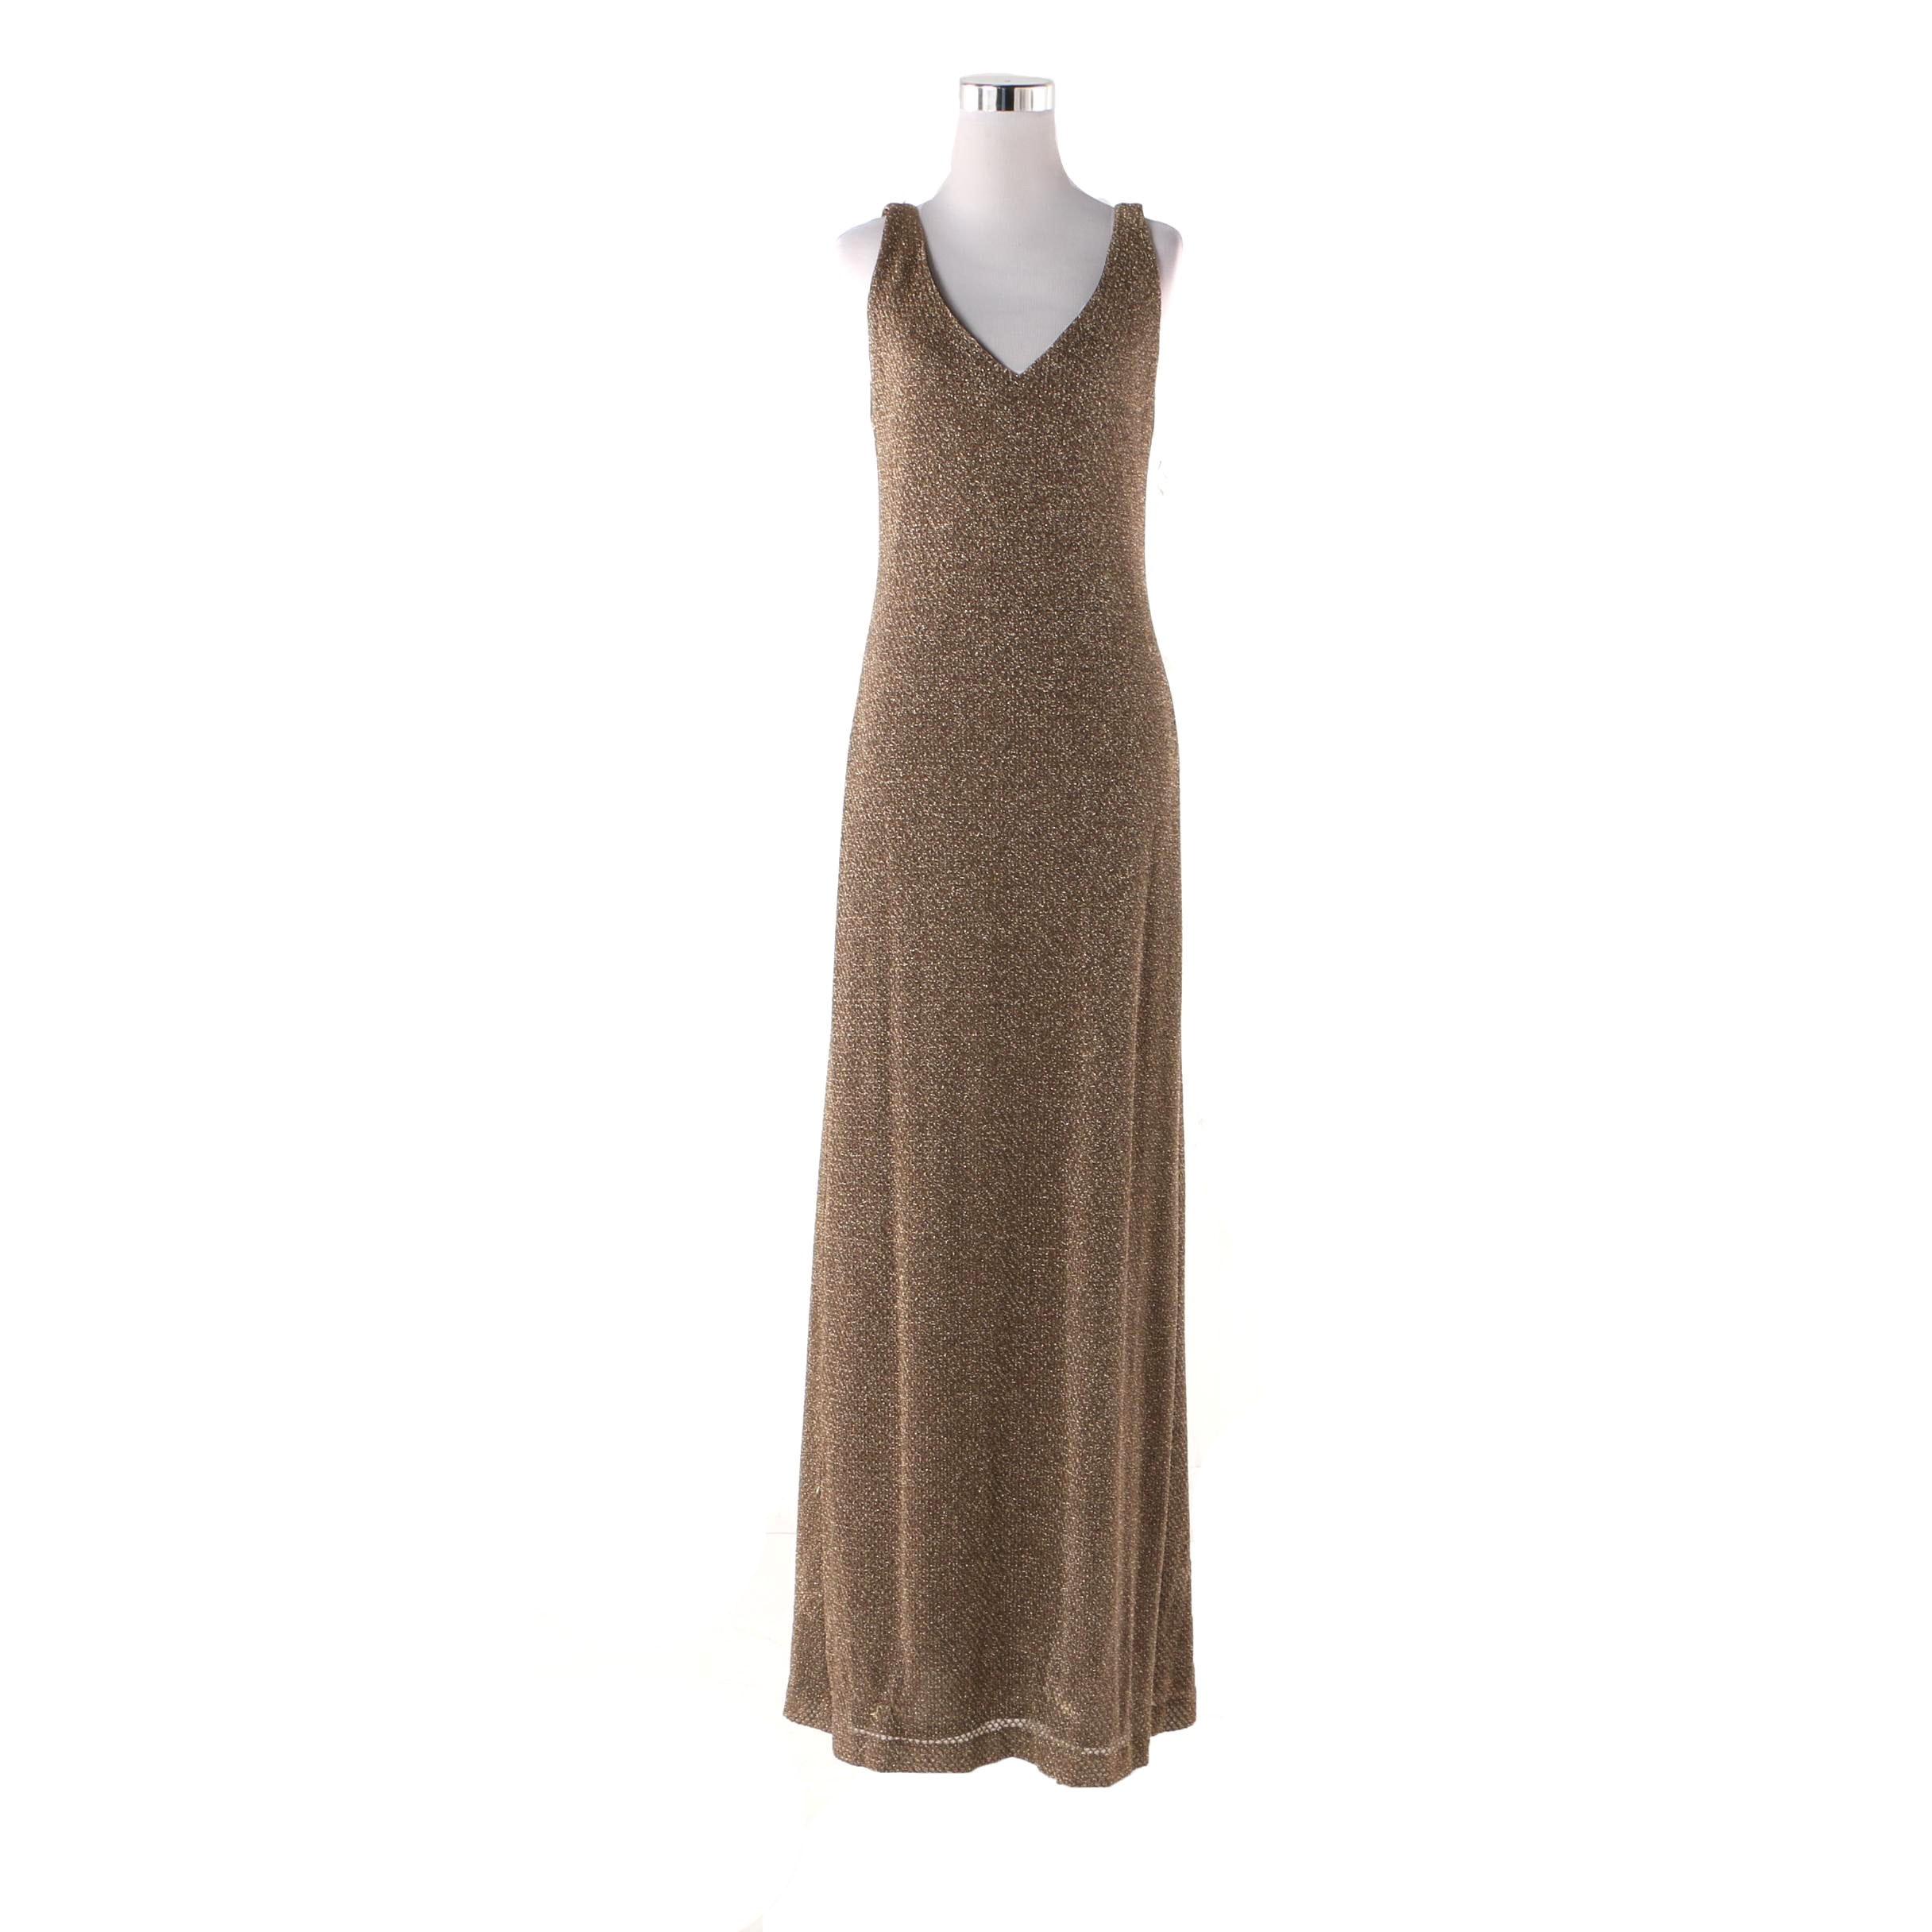 Andrea Polizzi for Rex Lester Bronze Metallic Sheath Dress